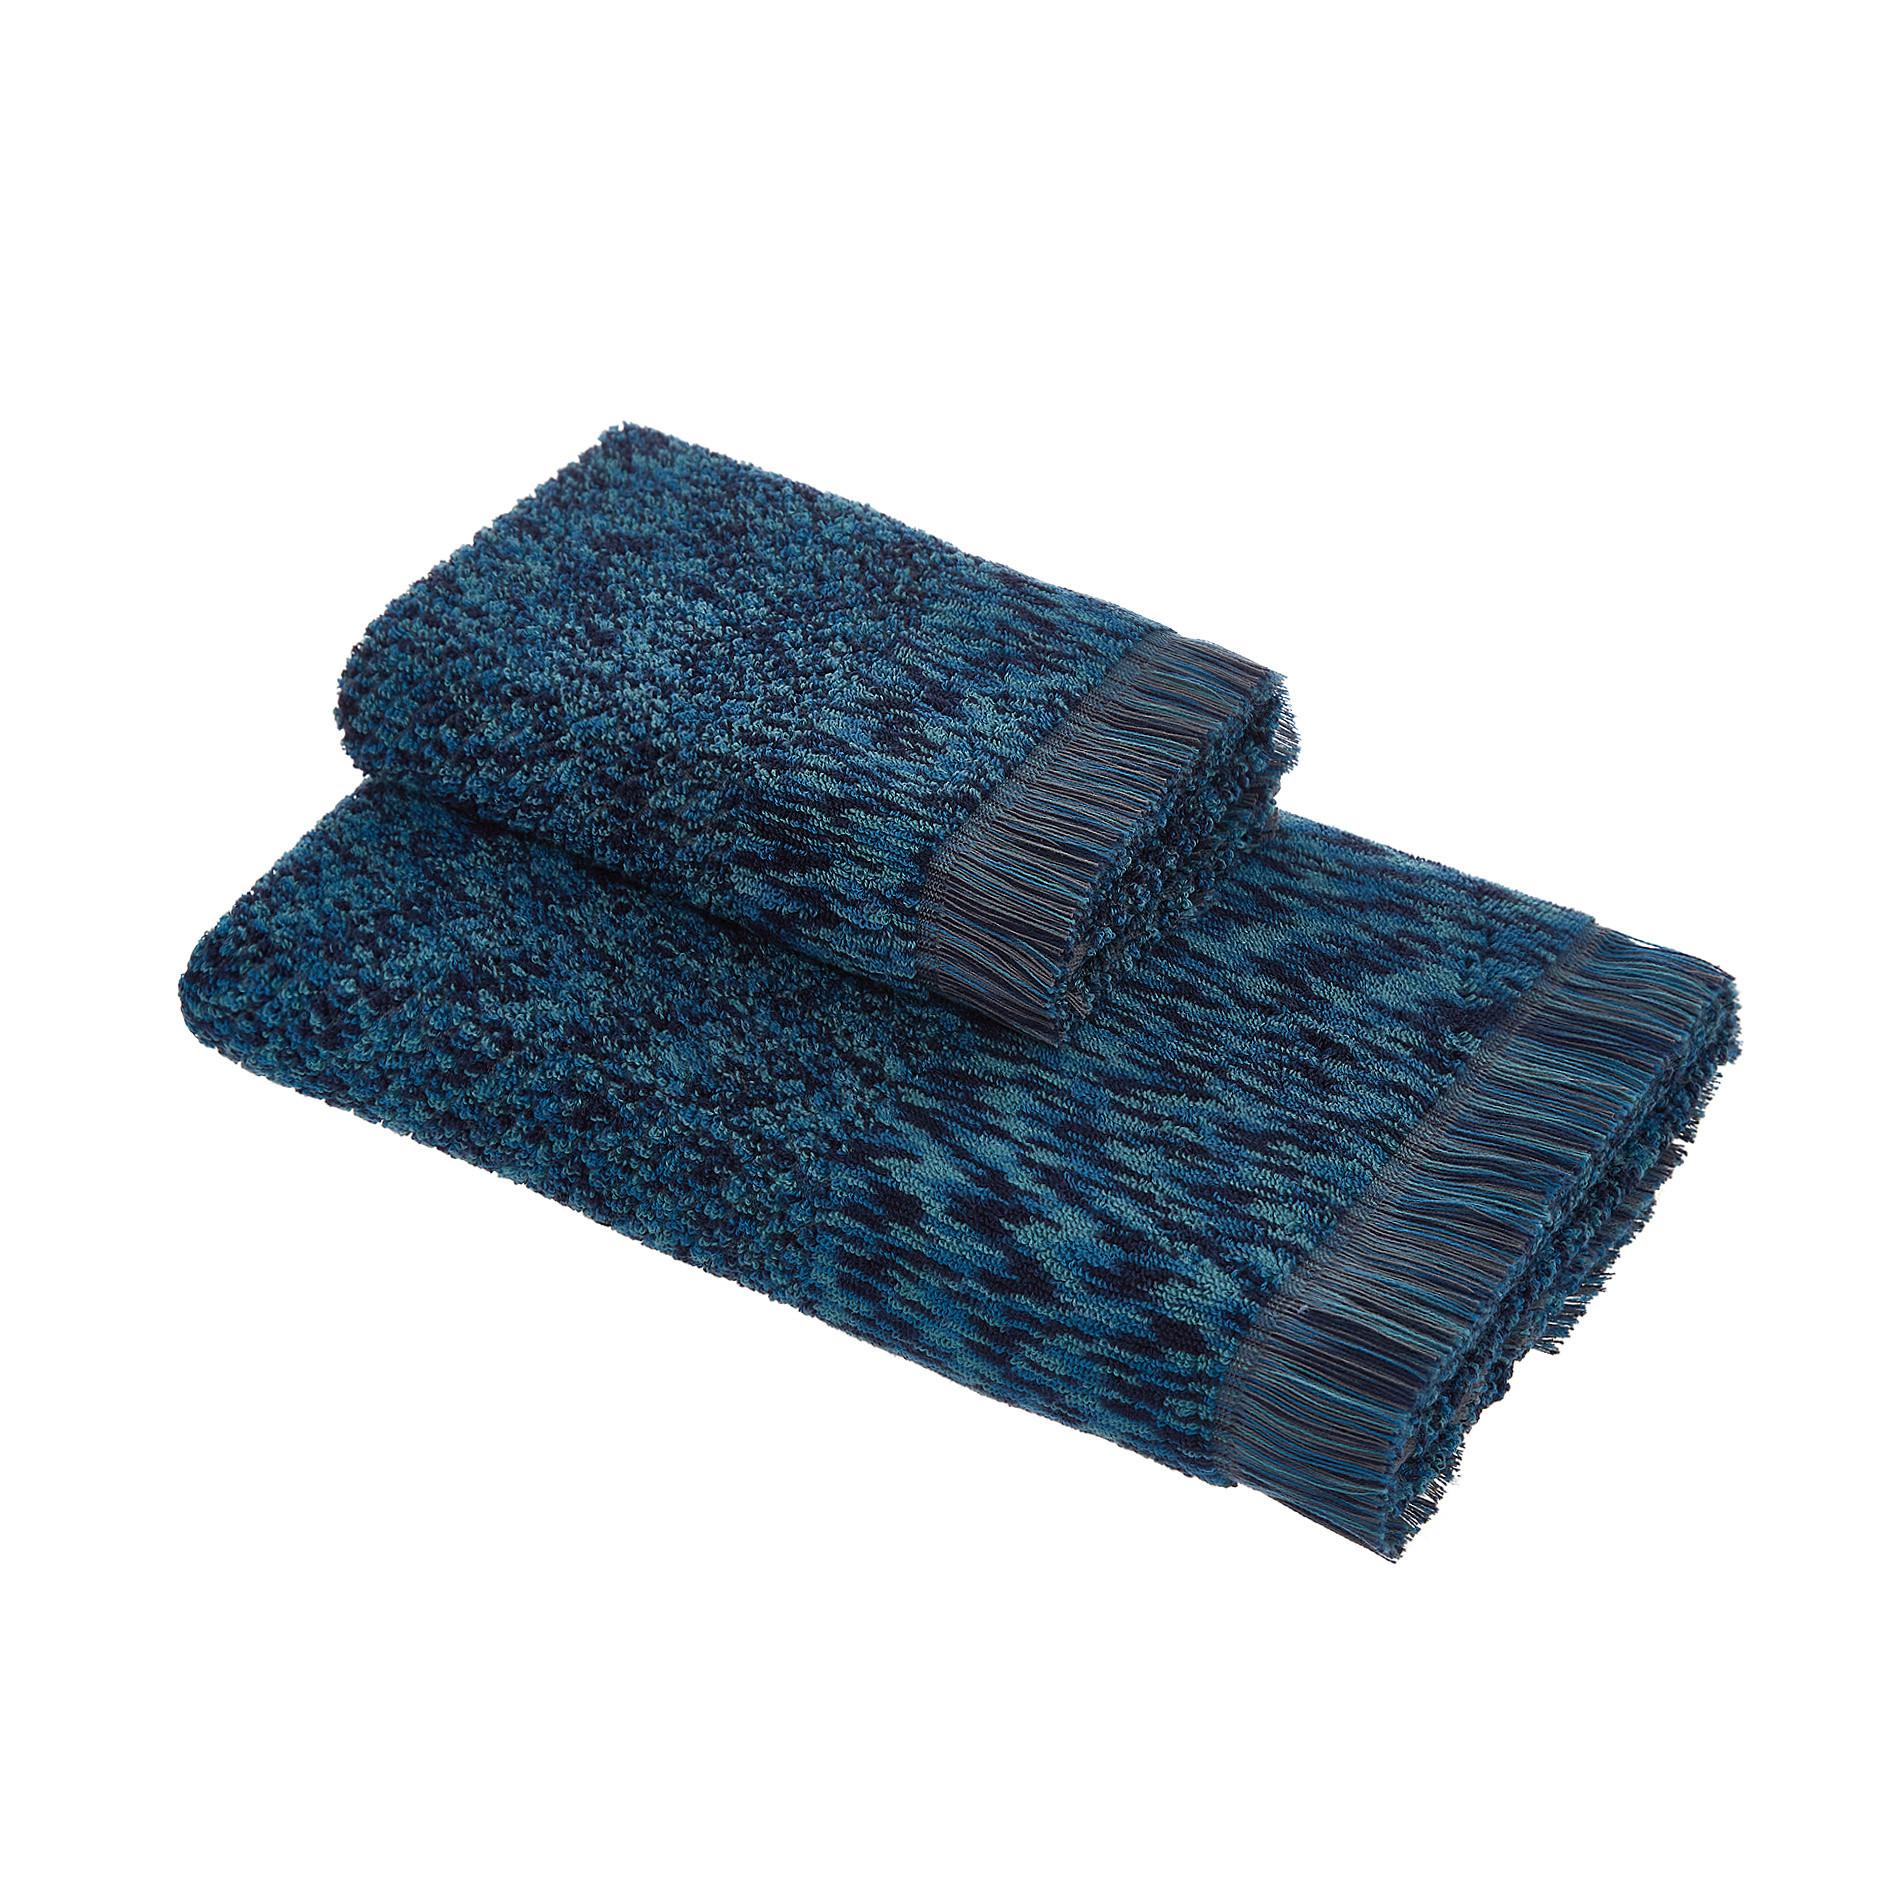 Asciugamano spugna di cotone effetto melange, Blu, large image number 0